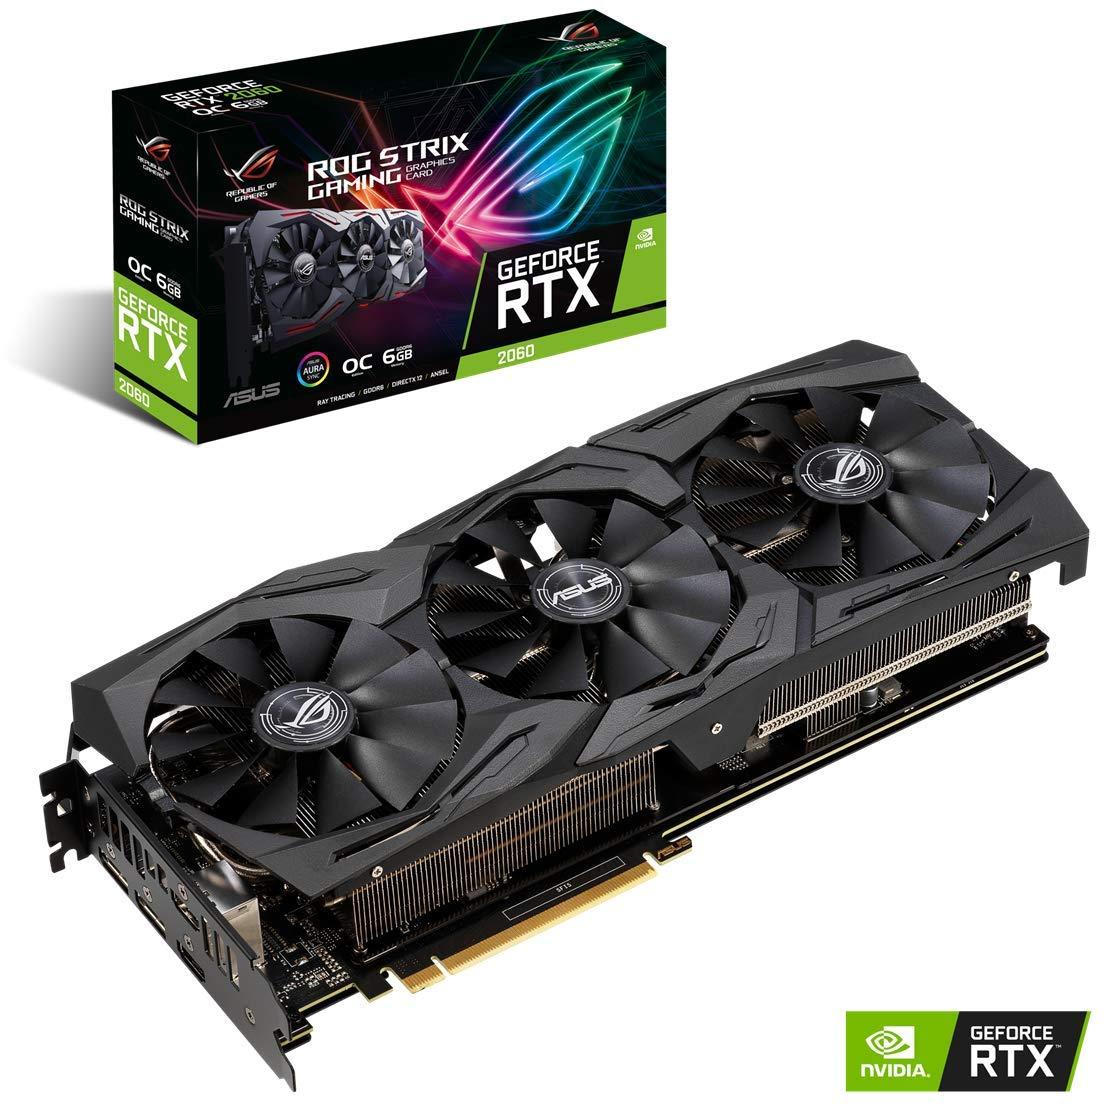 ASUS ROG Strix GeForce RTX 2060 Overclocked 6G GDDR6 HDMI DP 1.4 Gaming Graphics Card (ROG-STRIX-RTX-2060-O6G) by ASUS (Image #1)